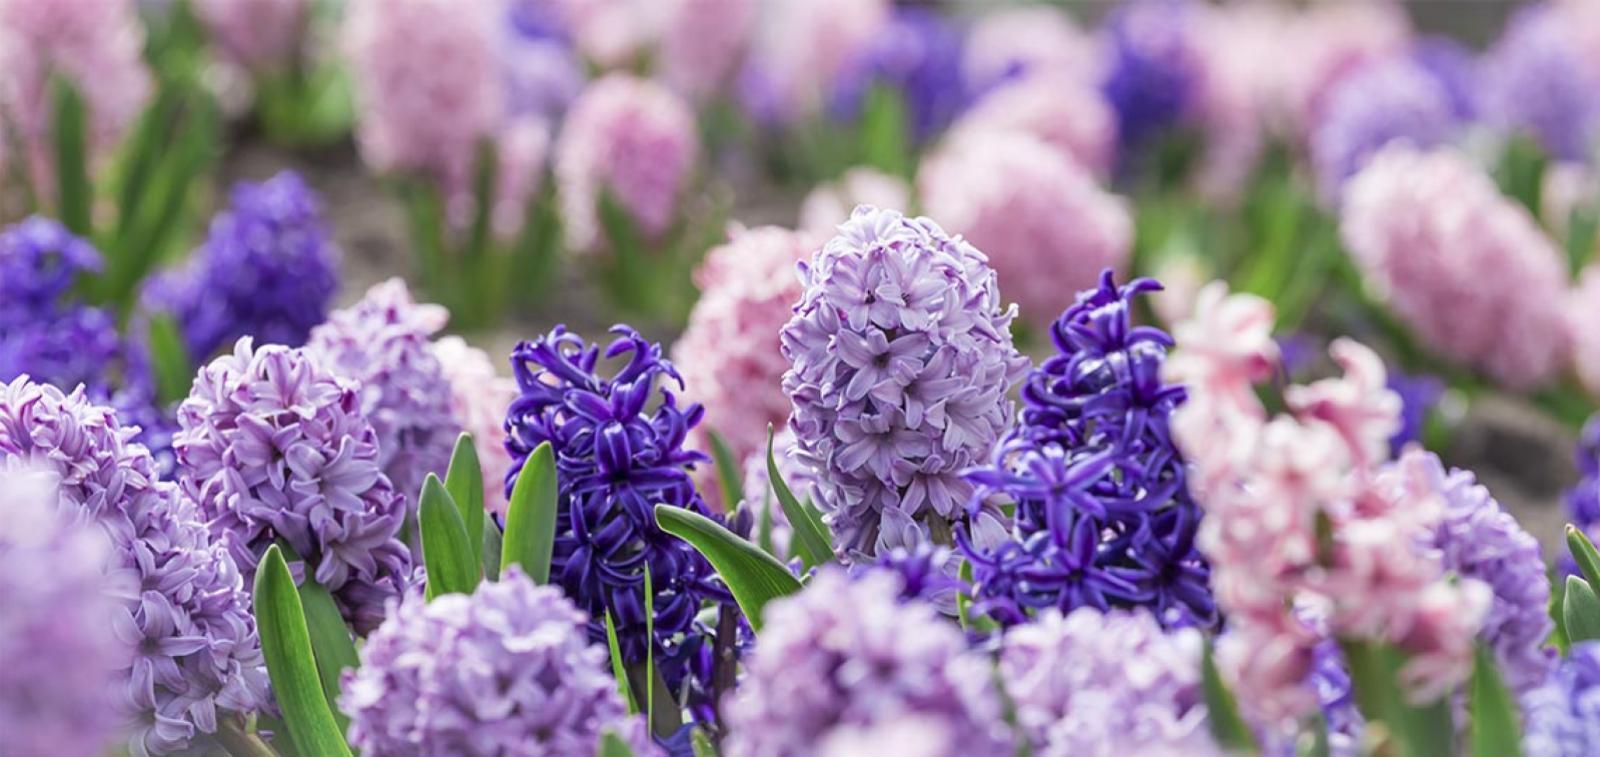 Selection of Hyacinth plants